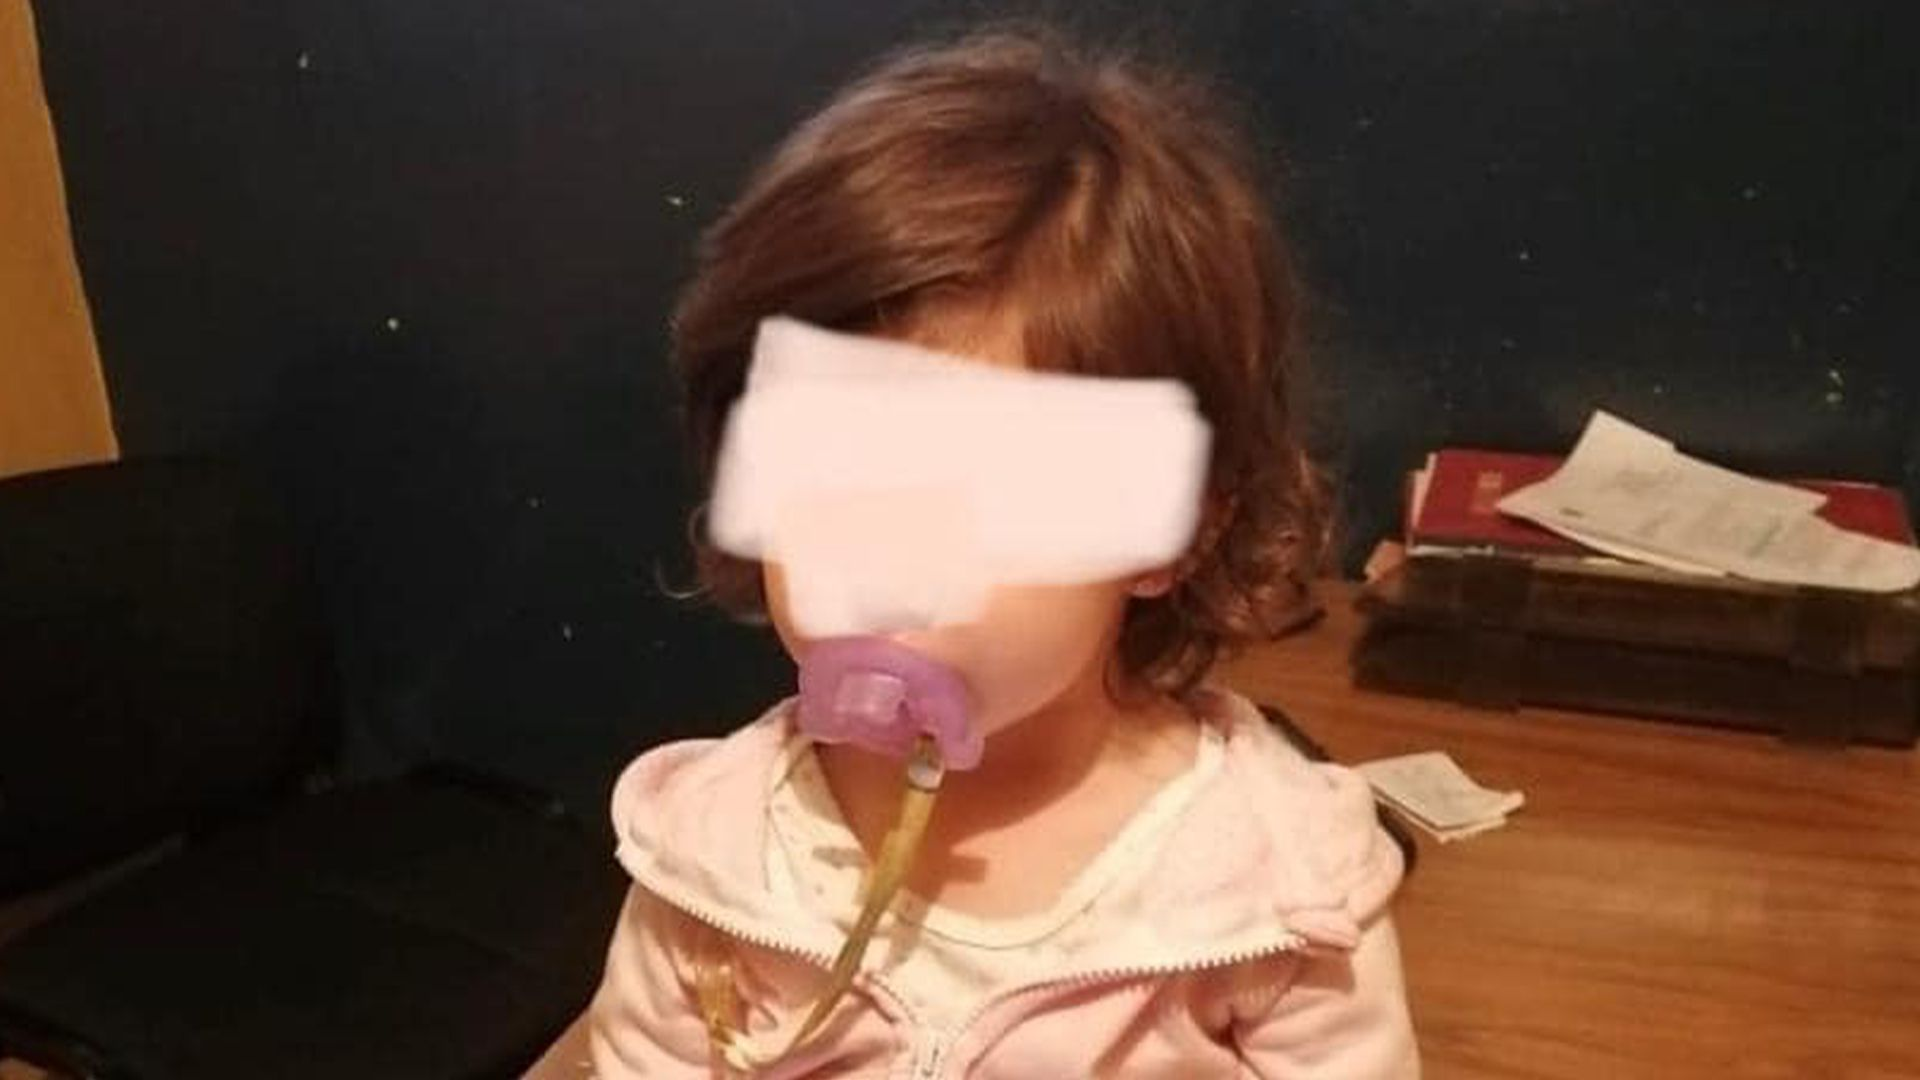 Localizan a niña de familia desaparecida en Jalisco (Foto: Facebook)